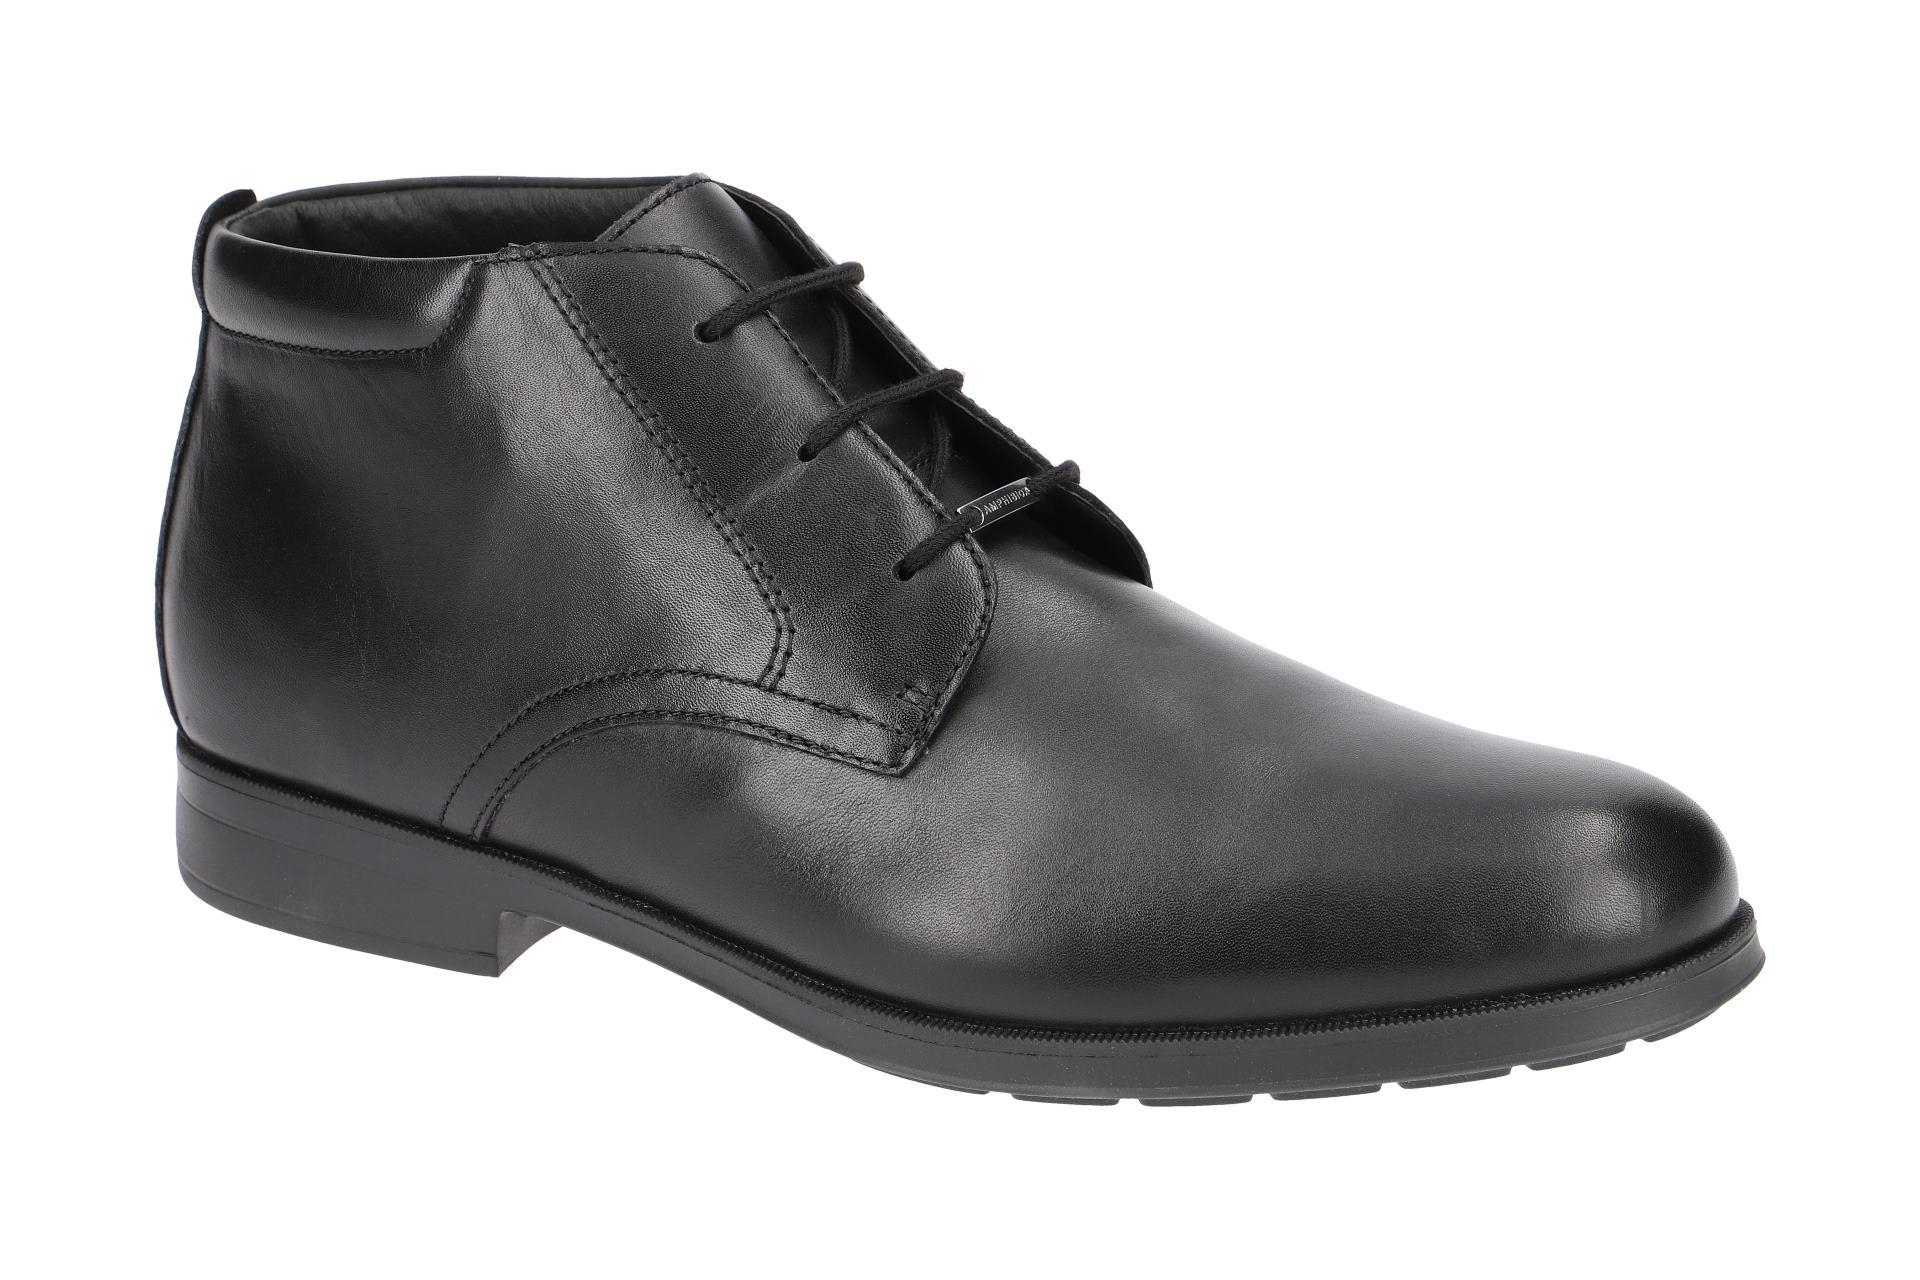 Details zu Geox Schuhe HILSTONE ABX schwarz Herrenstiefelette U845TB 00043 C9999 NEU